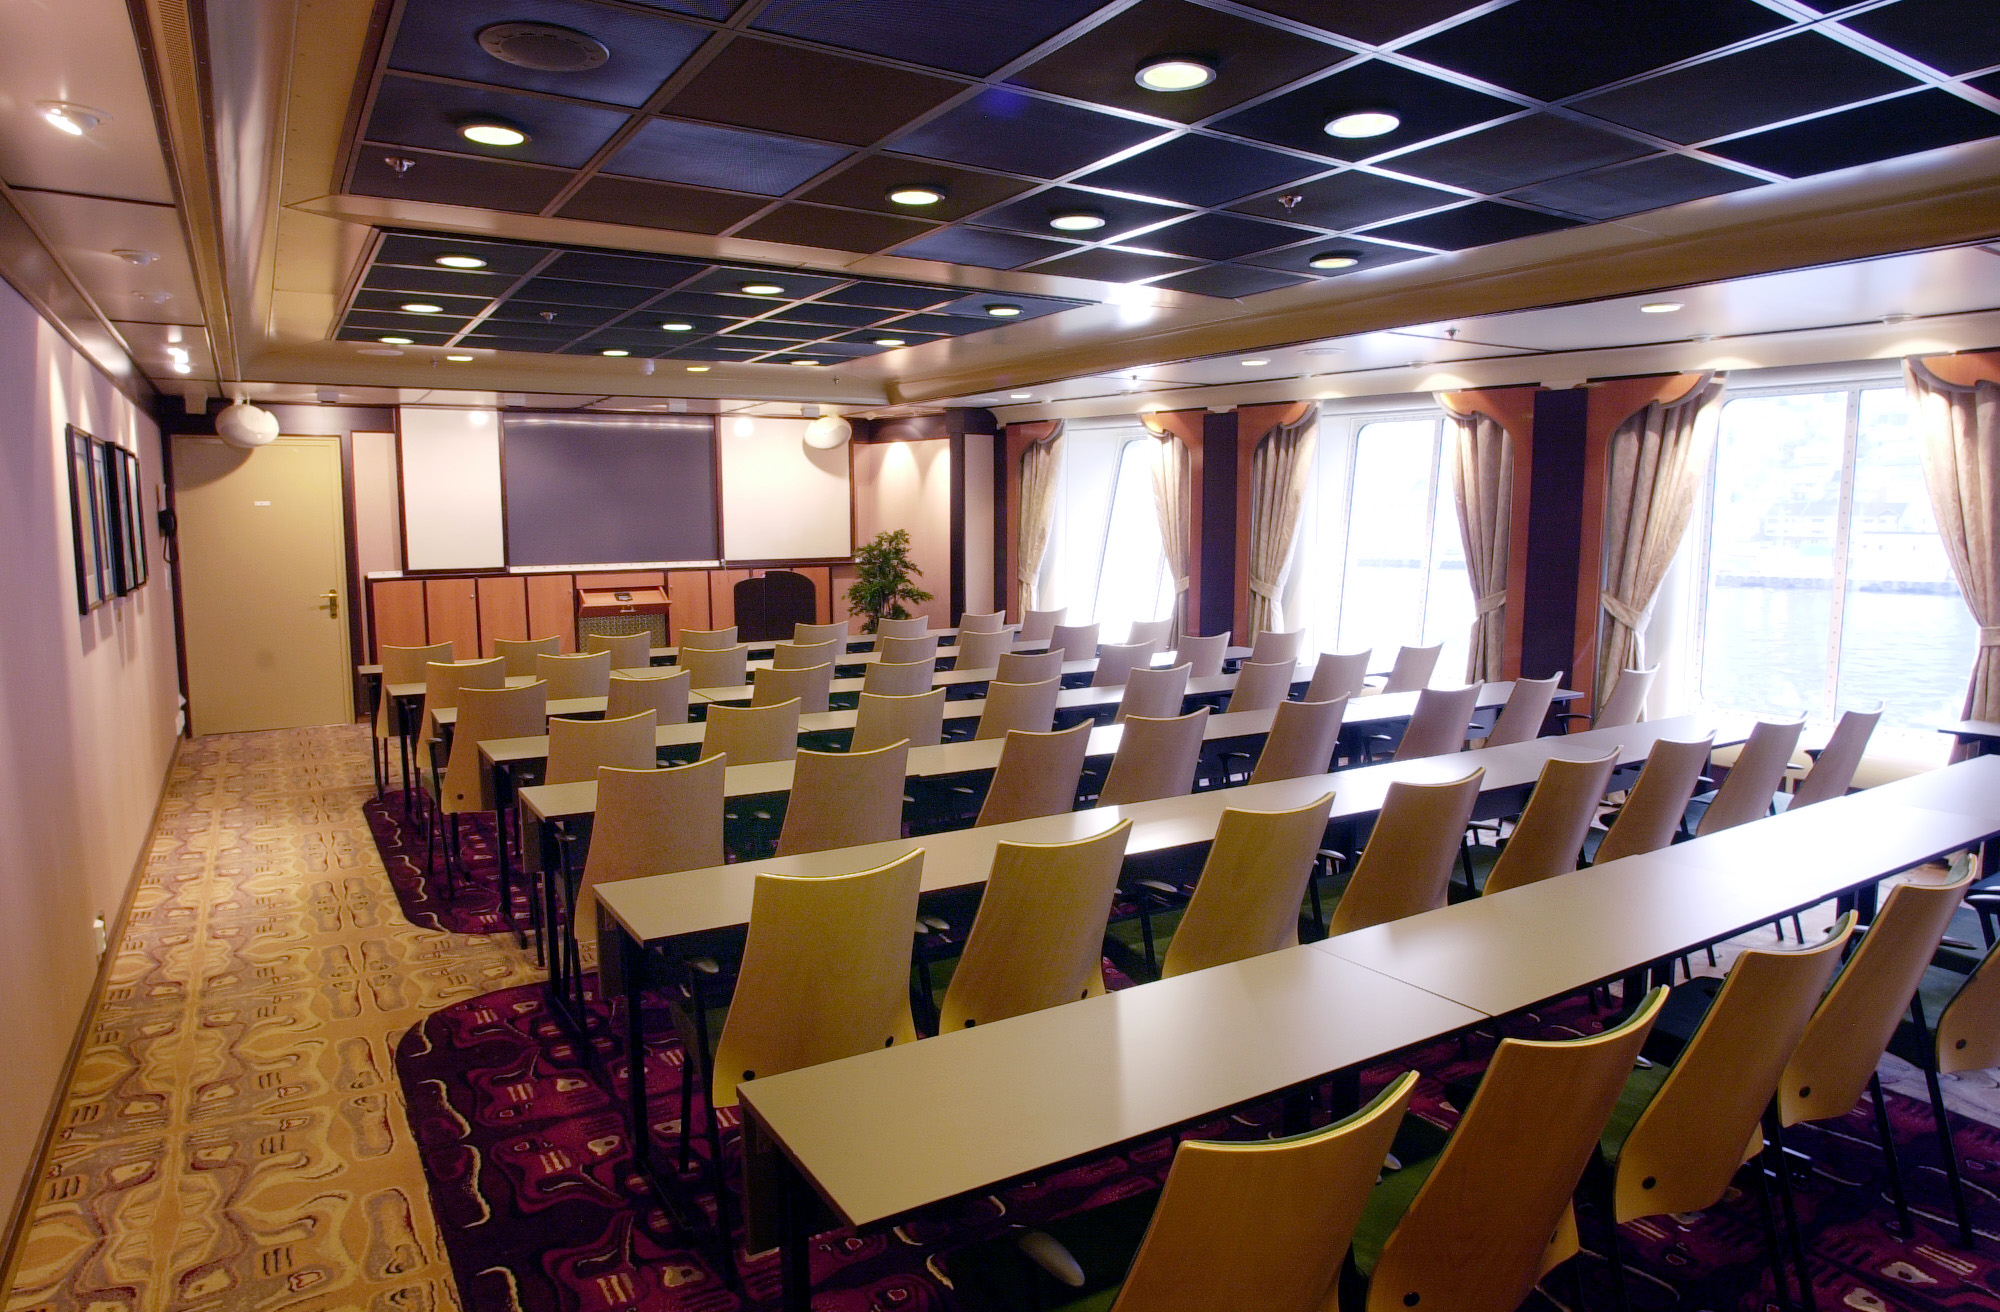 Hurtigruten Cruise Lines MS Finnmarken Interior Lecture Room.jpg